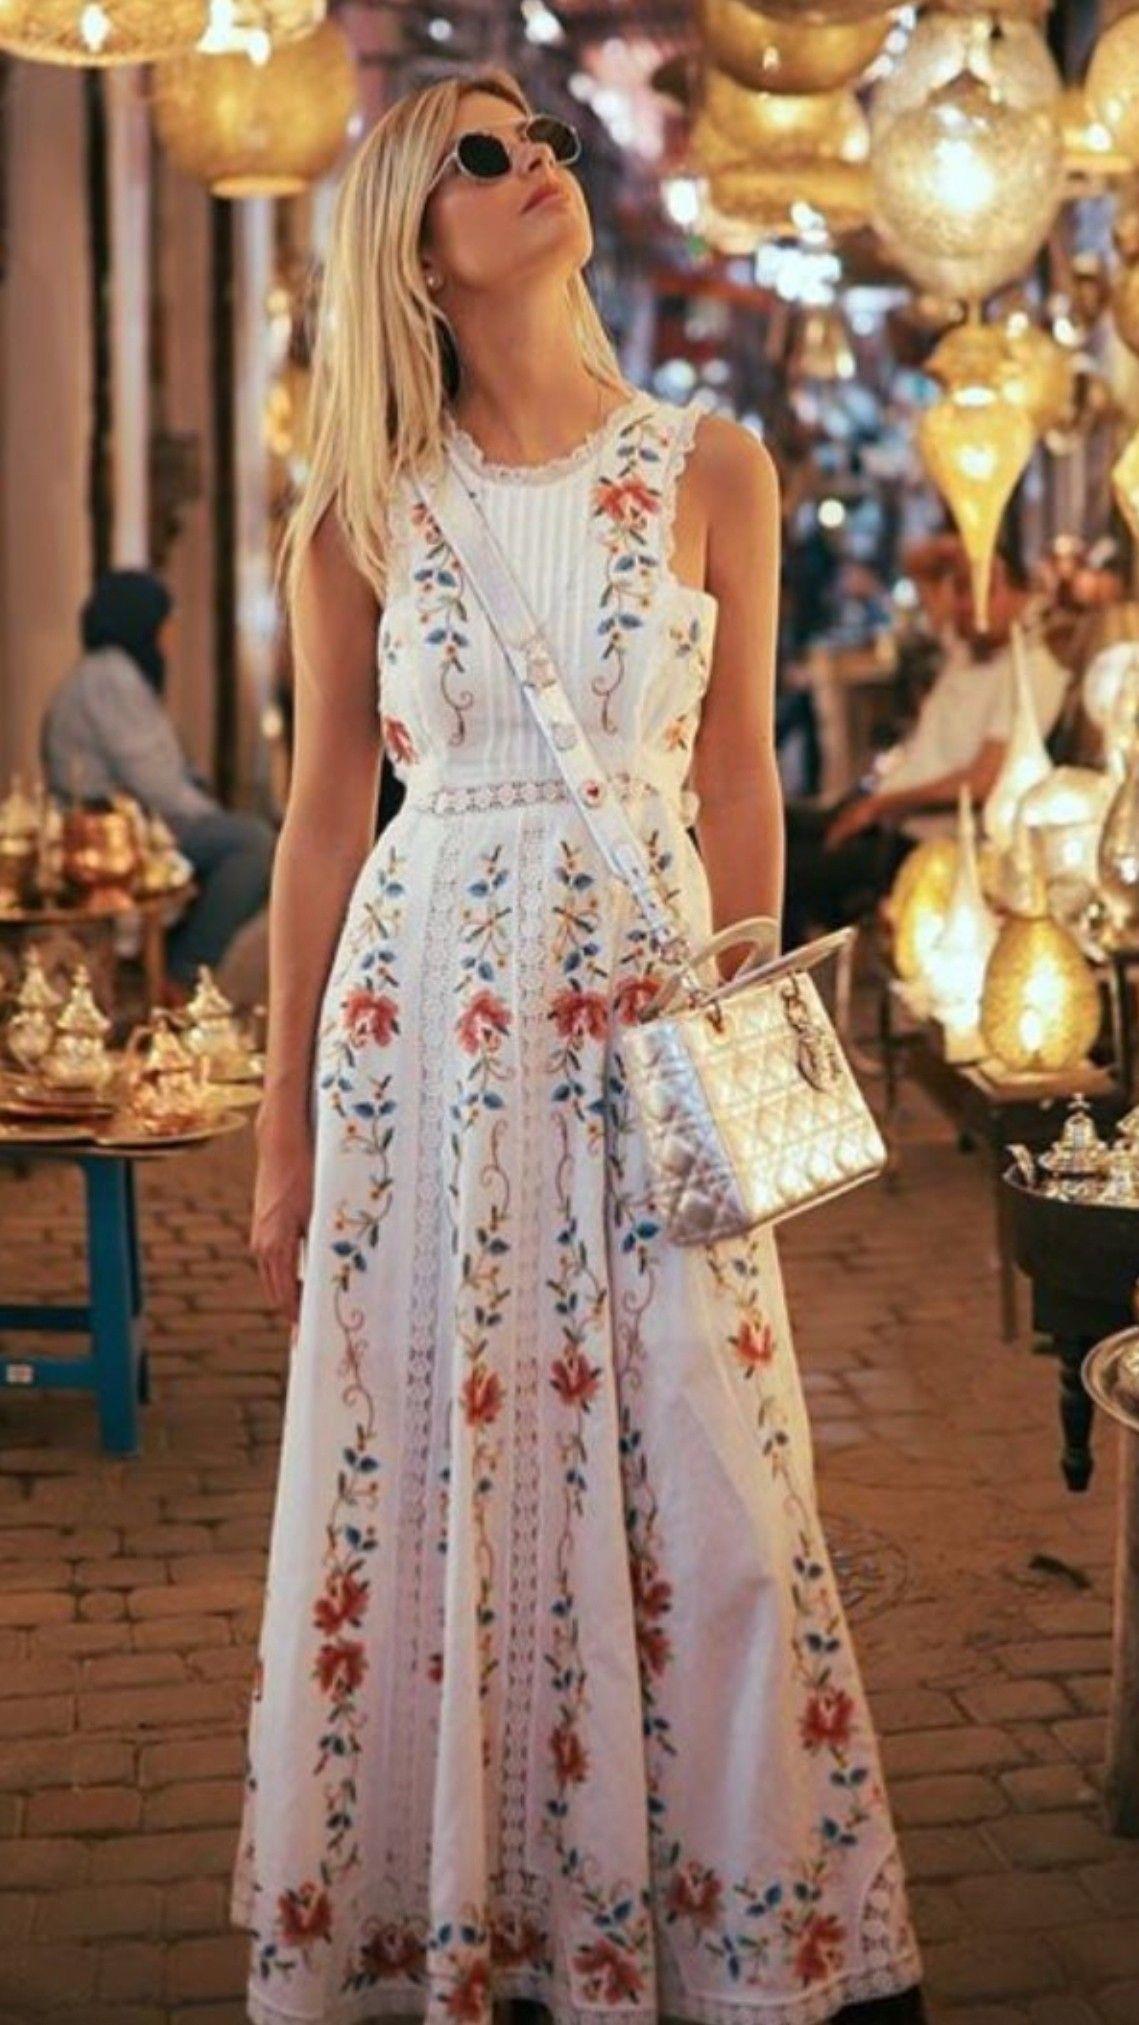 Pretty Embroidered Maxi Dress Embroidered Maxi Dress Maxi Dress Outfit Maxi Dress [ 2025 x 1139 Pixel ]